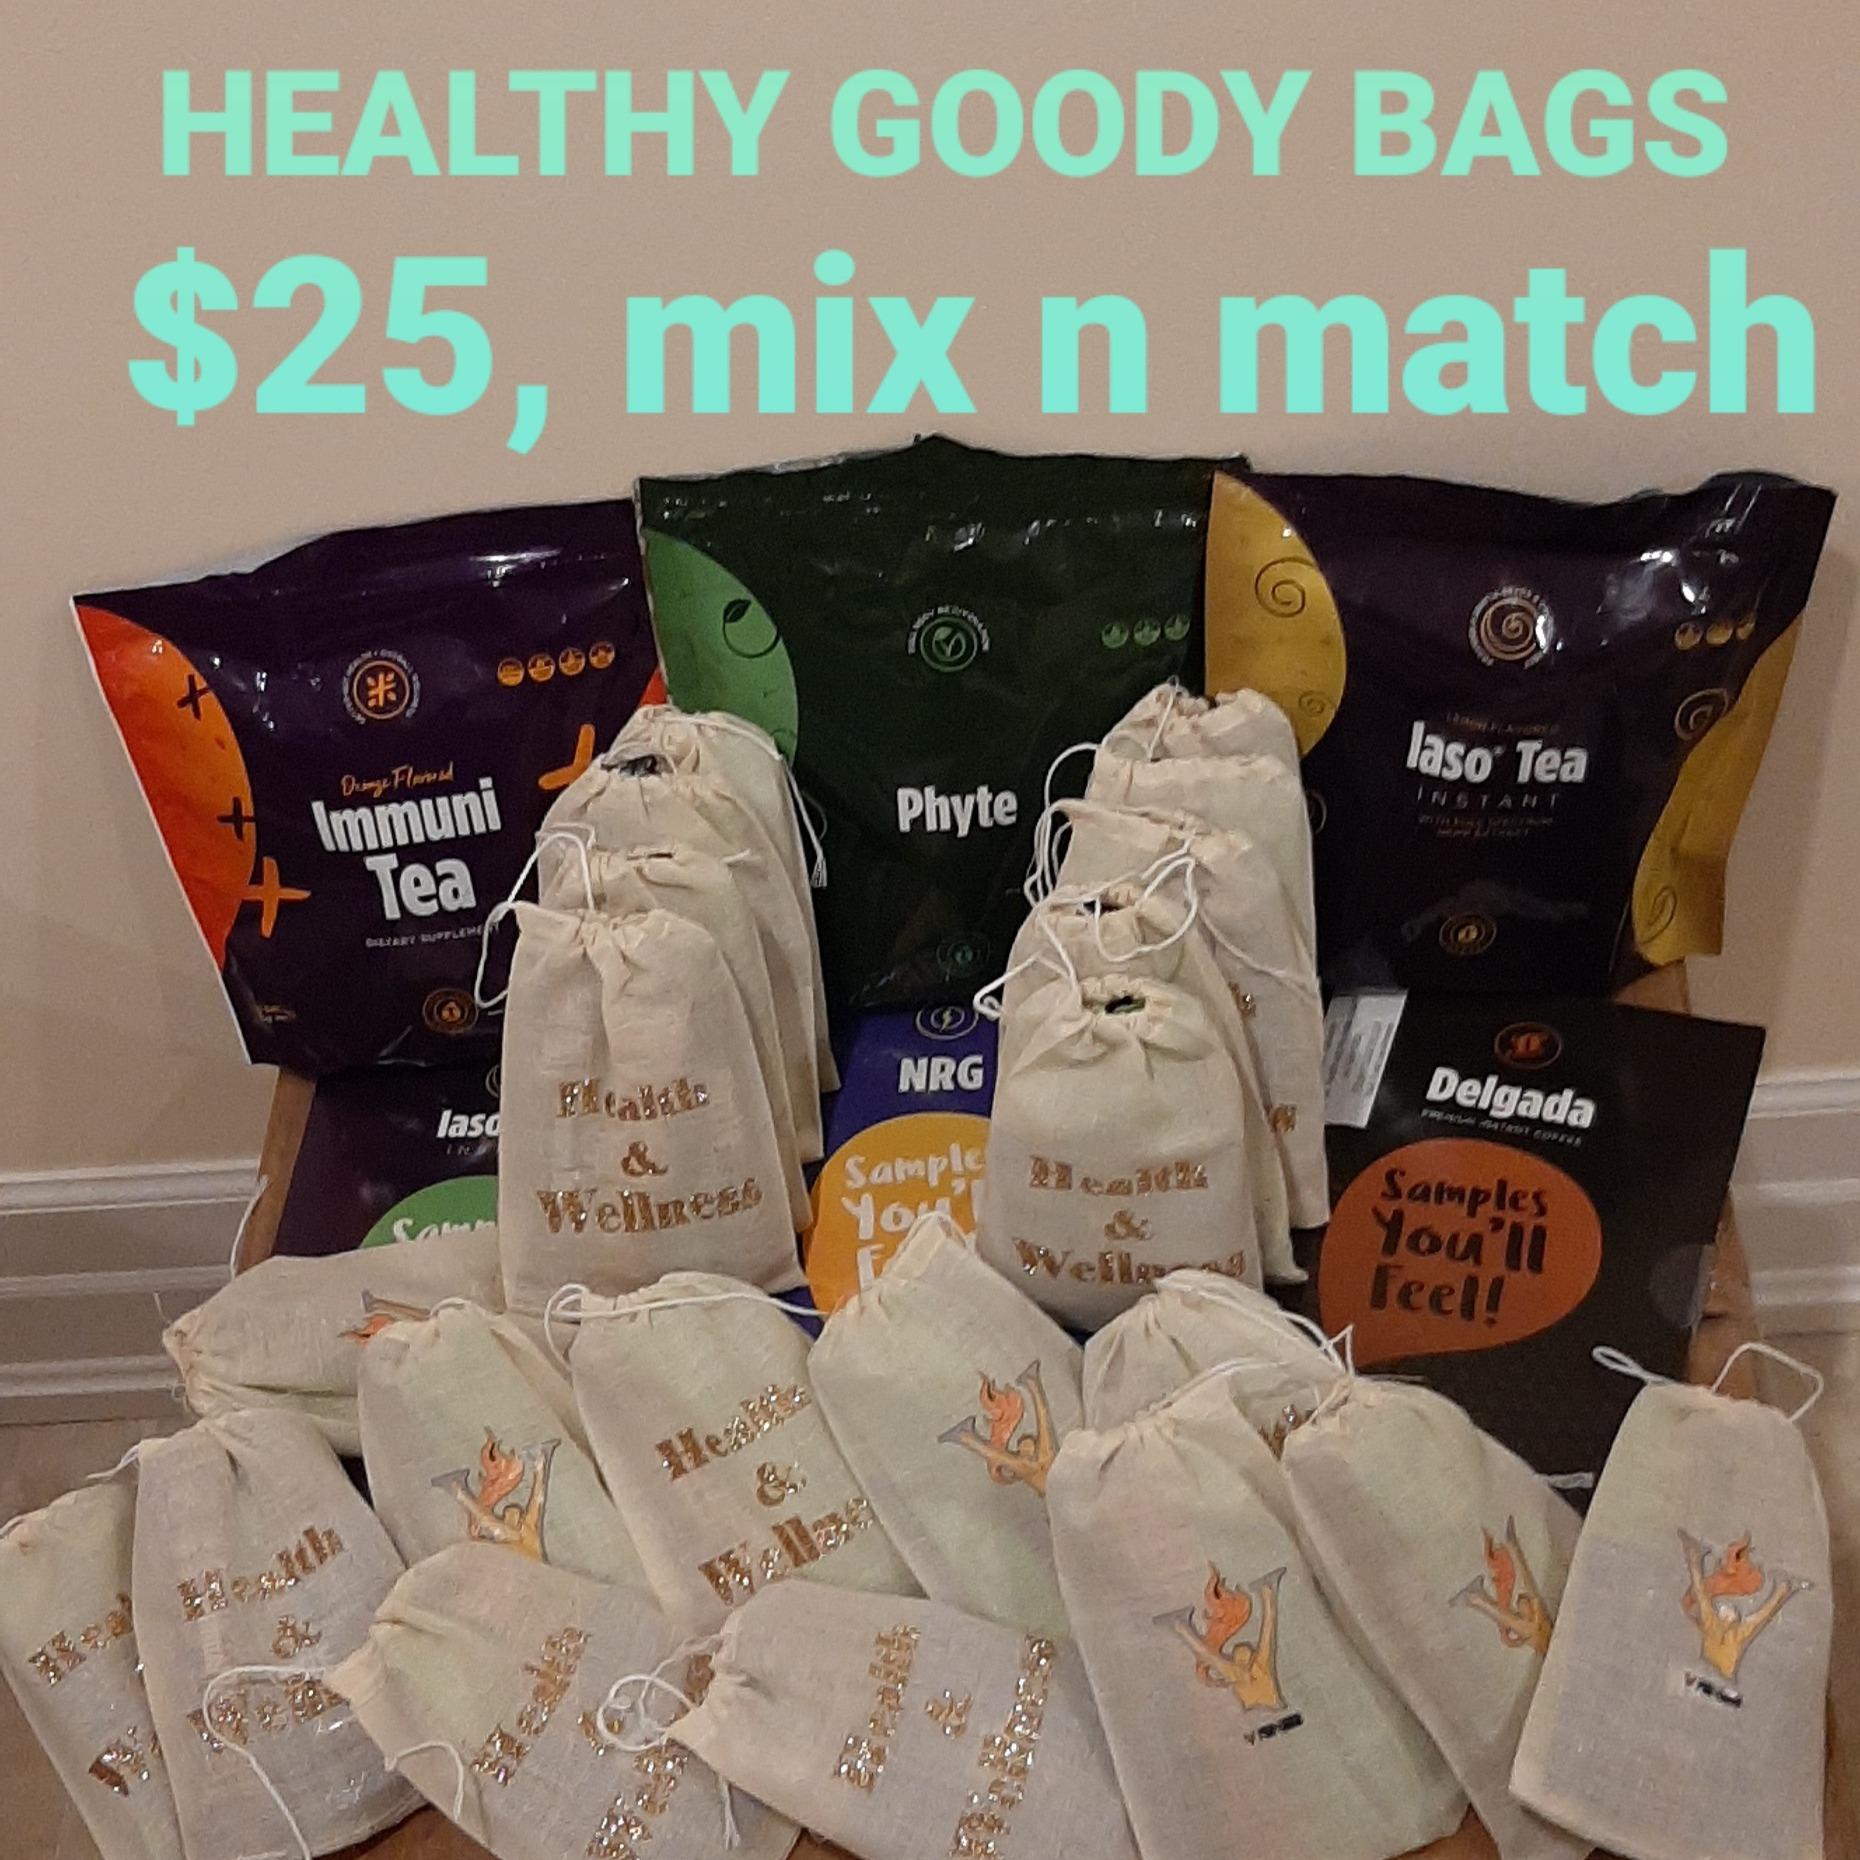 Sample goodie bag mix n match $25 - $35